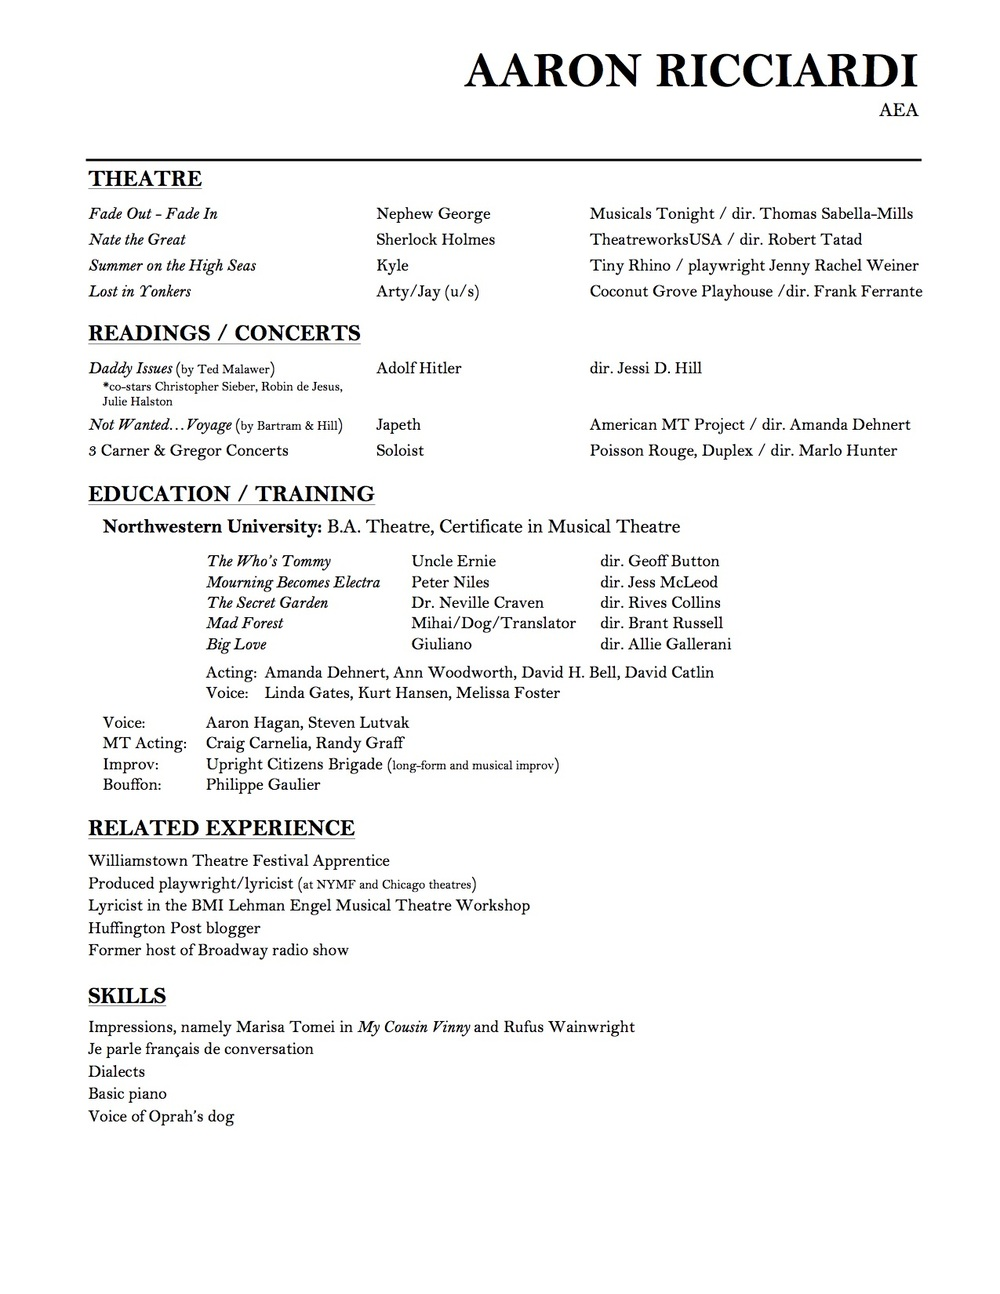 Aaron Ricciardi Acting Resume.jpg